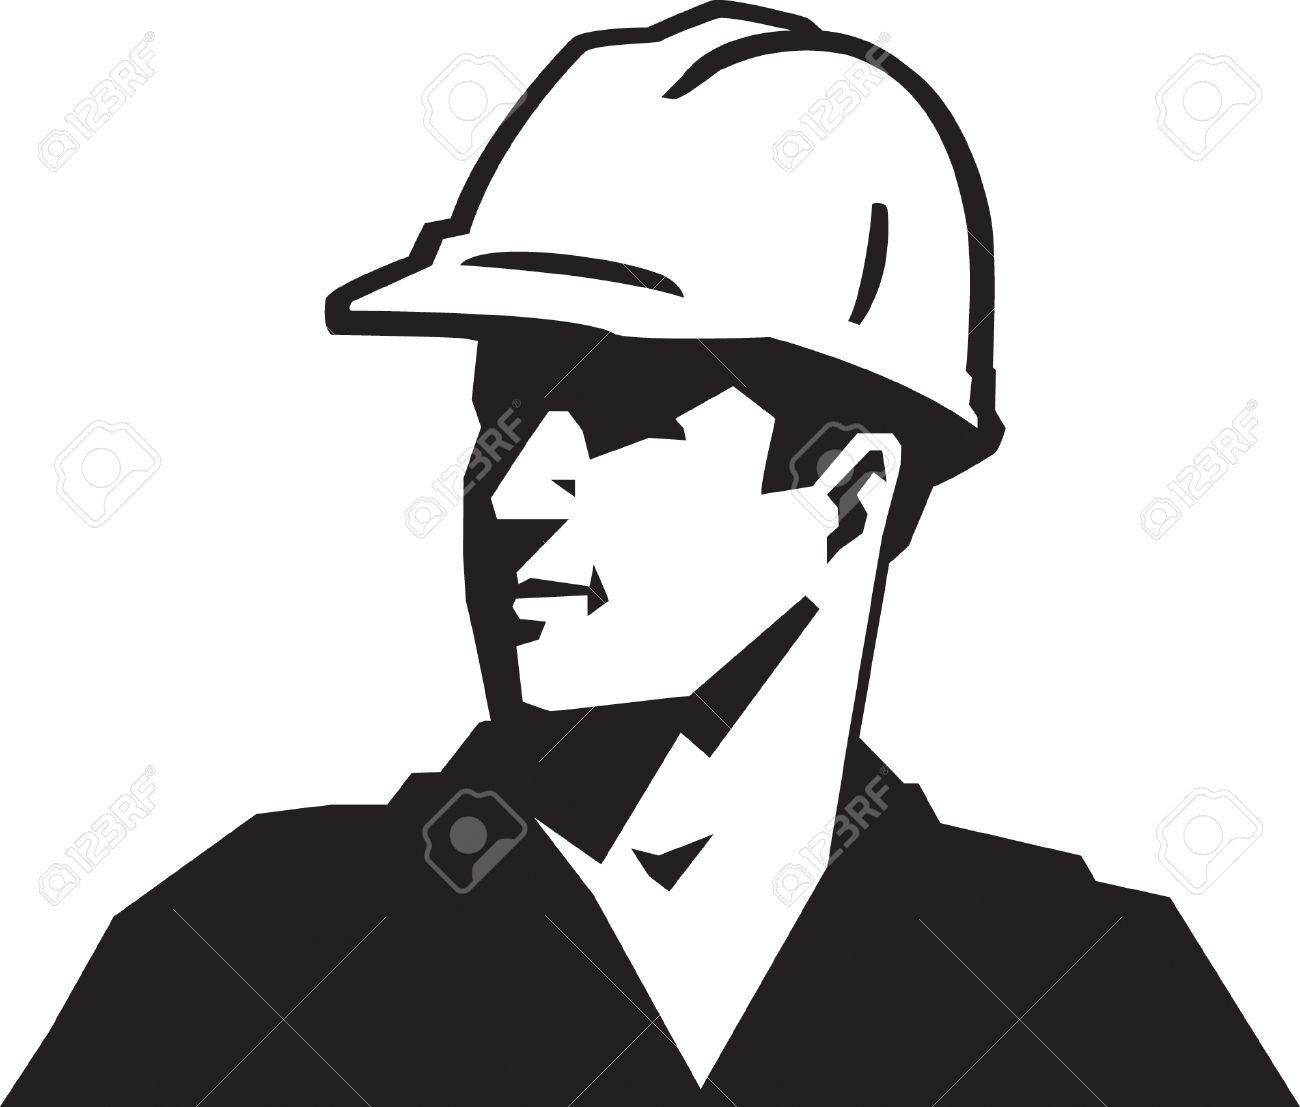 Construction Guy Stock Vector - 24305994